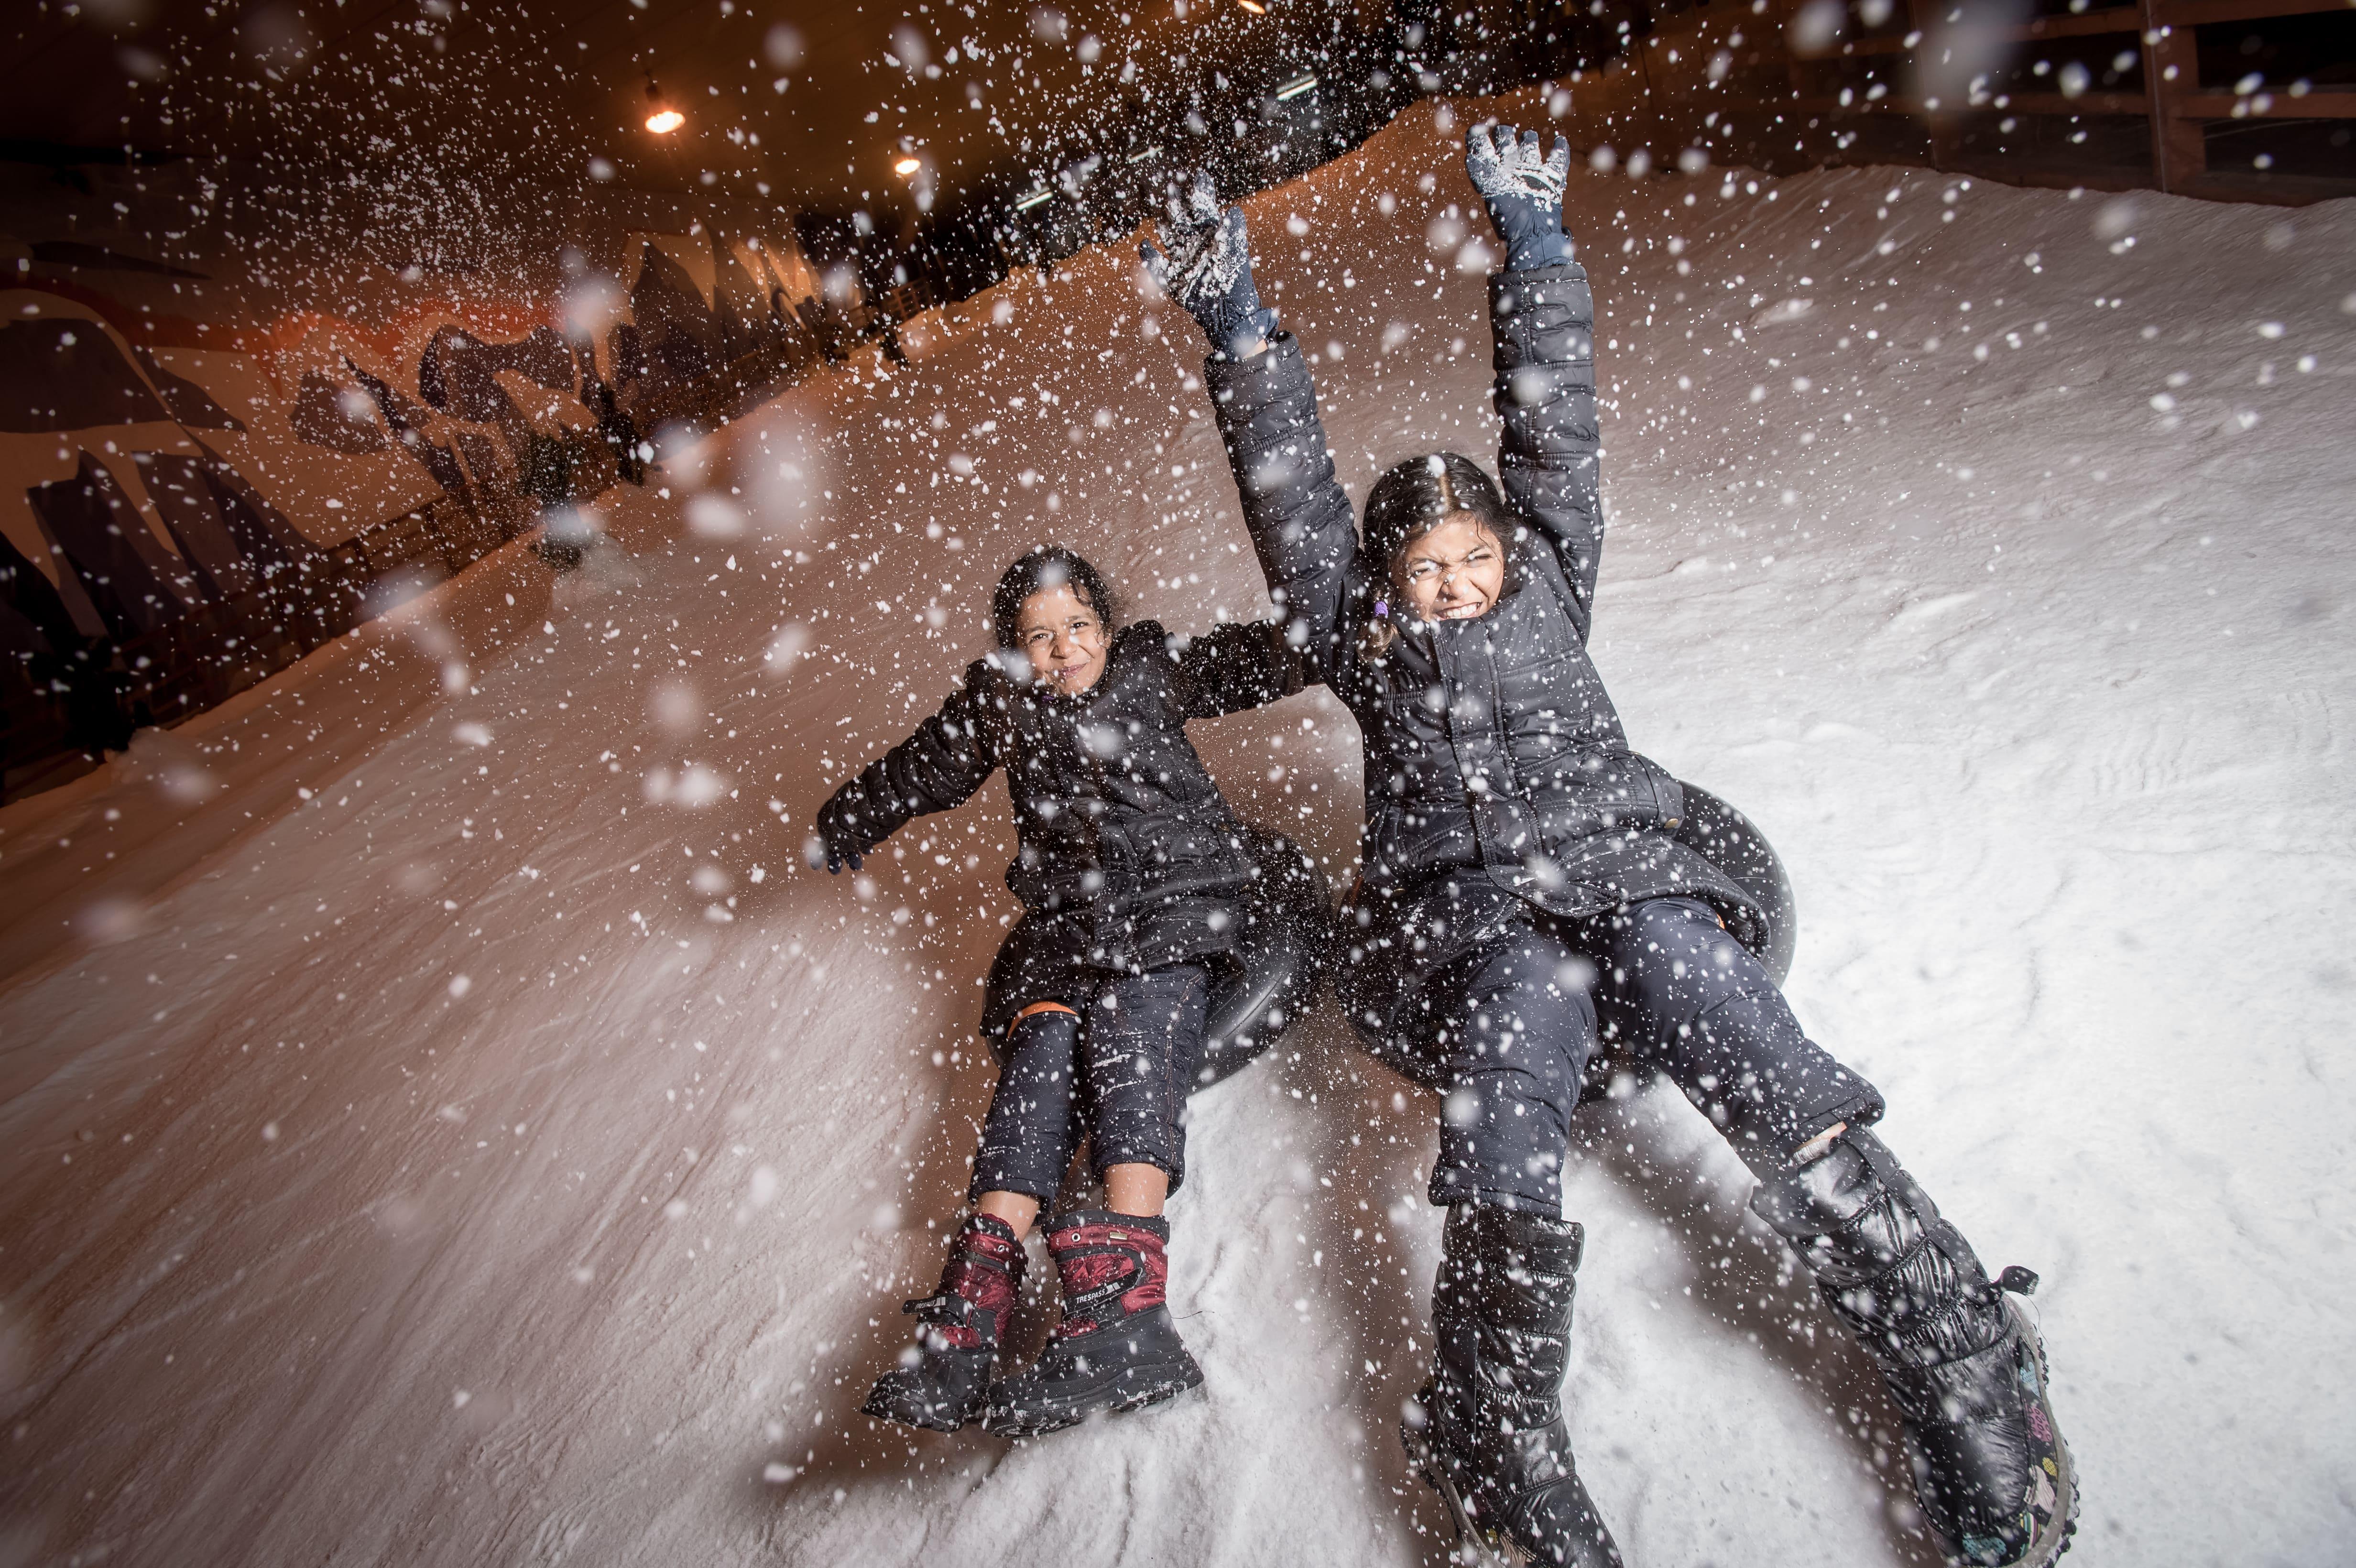 trượt tuyết tại winter wonderland